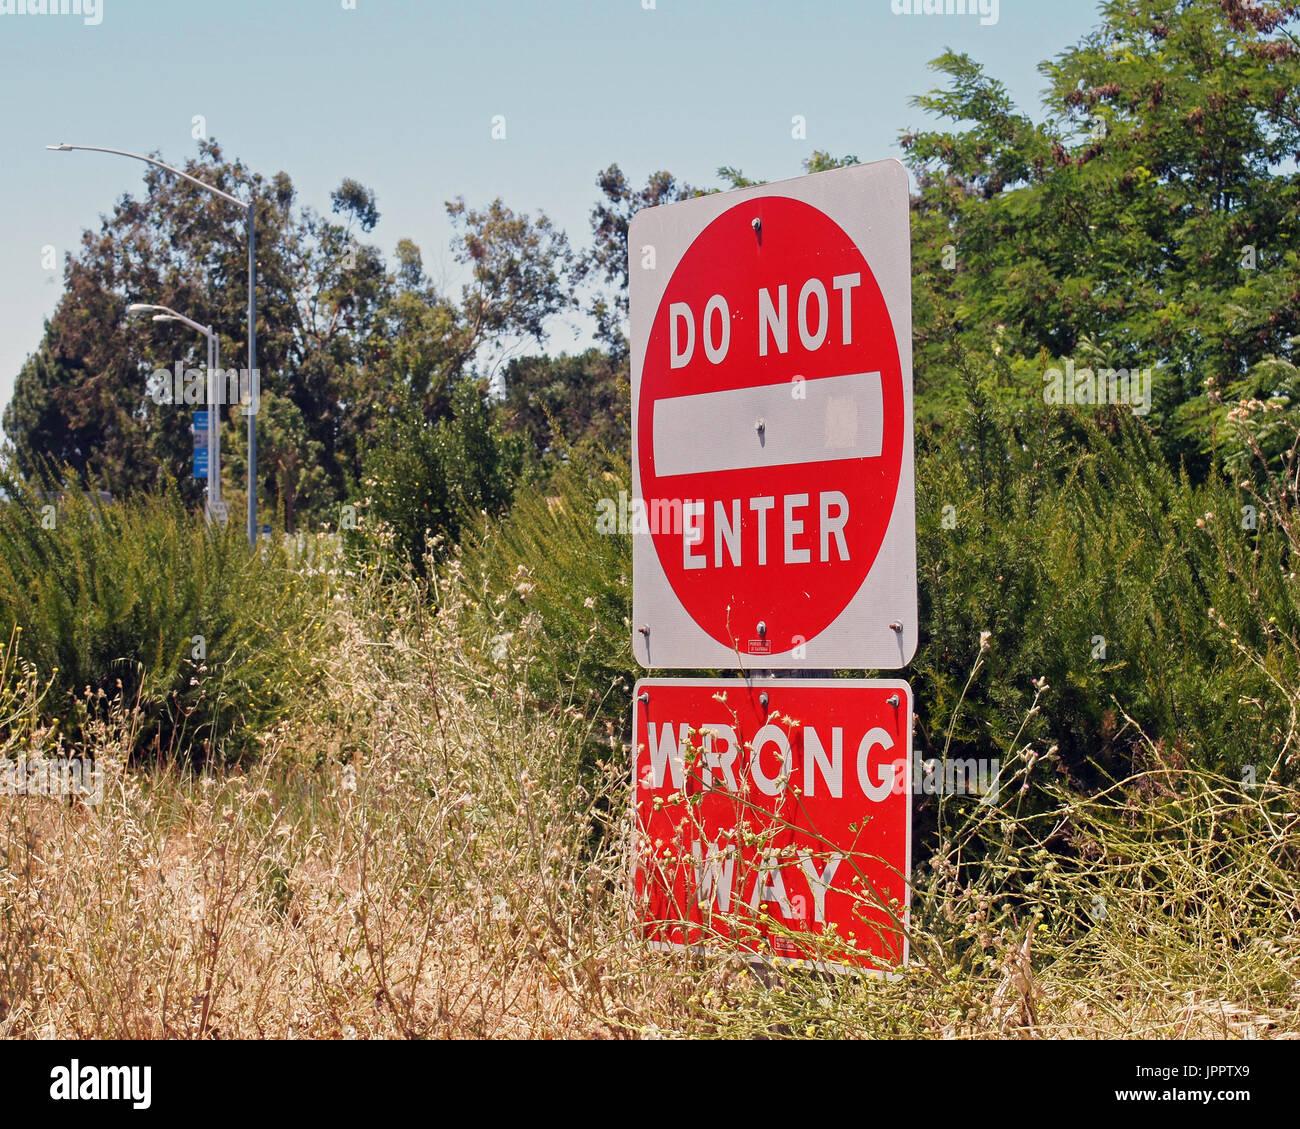 wrong way, do not enter. Traffic sign, symbol, California - Stock Image